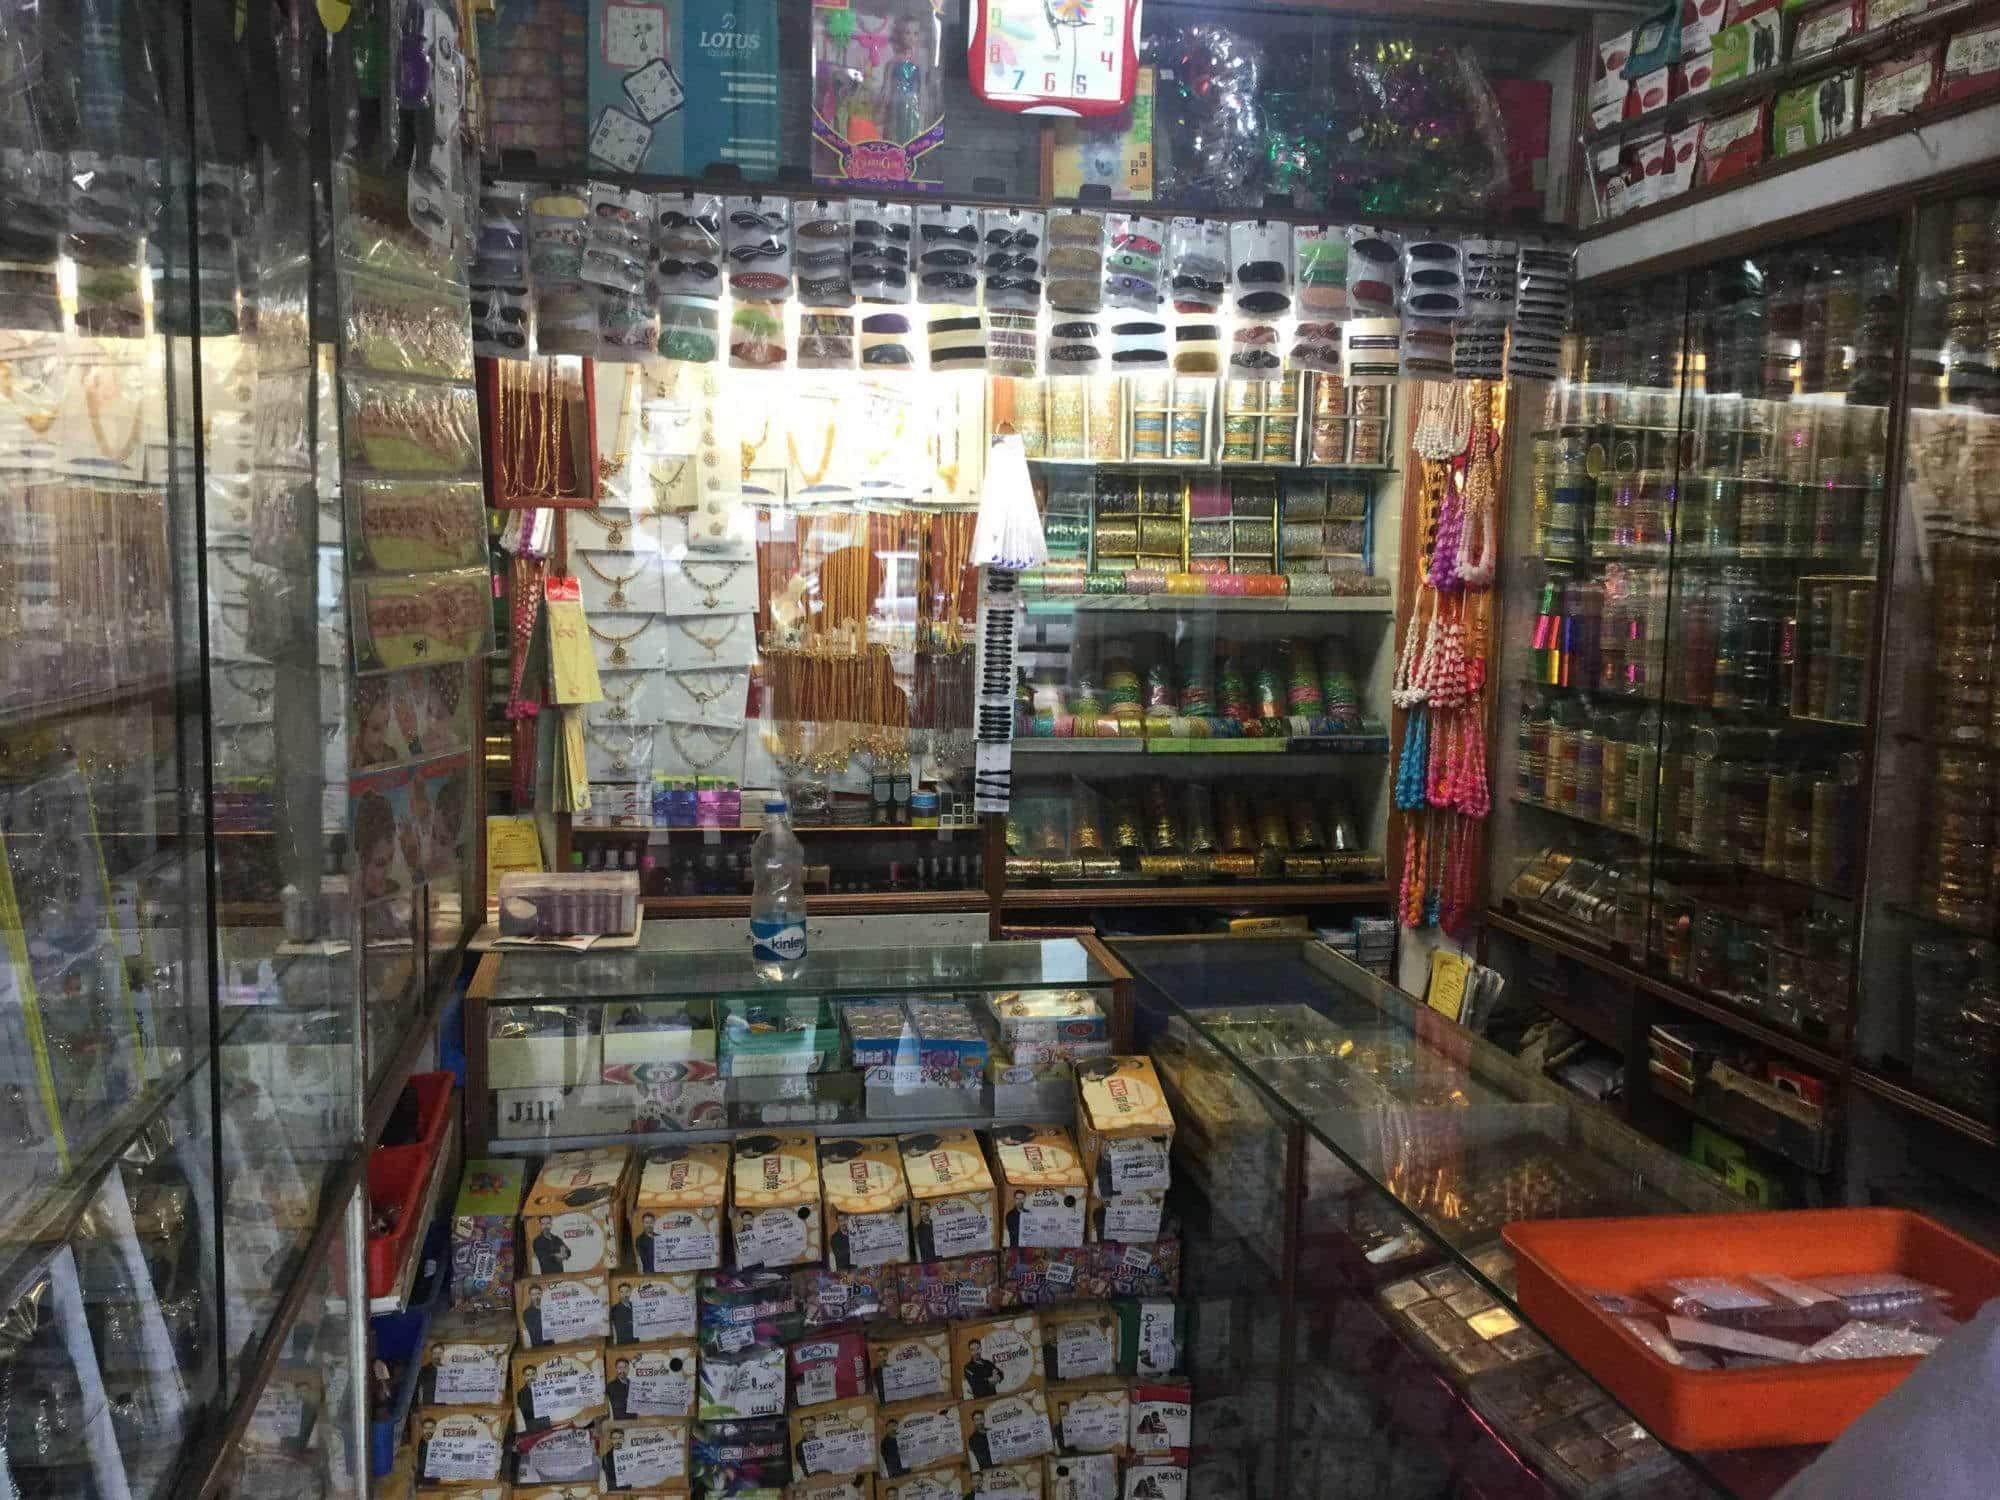 Tamilnadu fancy stores, Kottivakkam - Fancy Item Dealers in Chennai